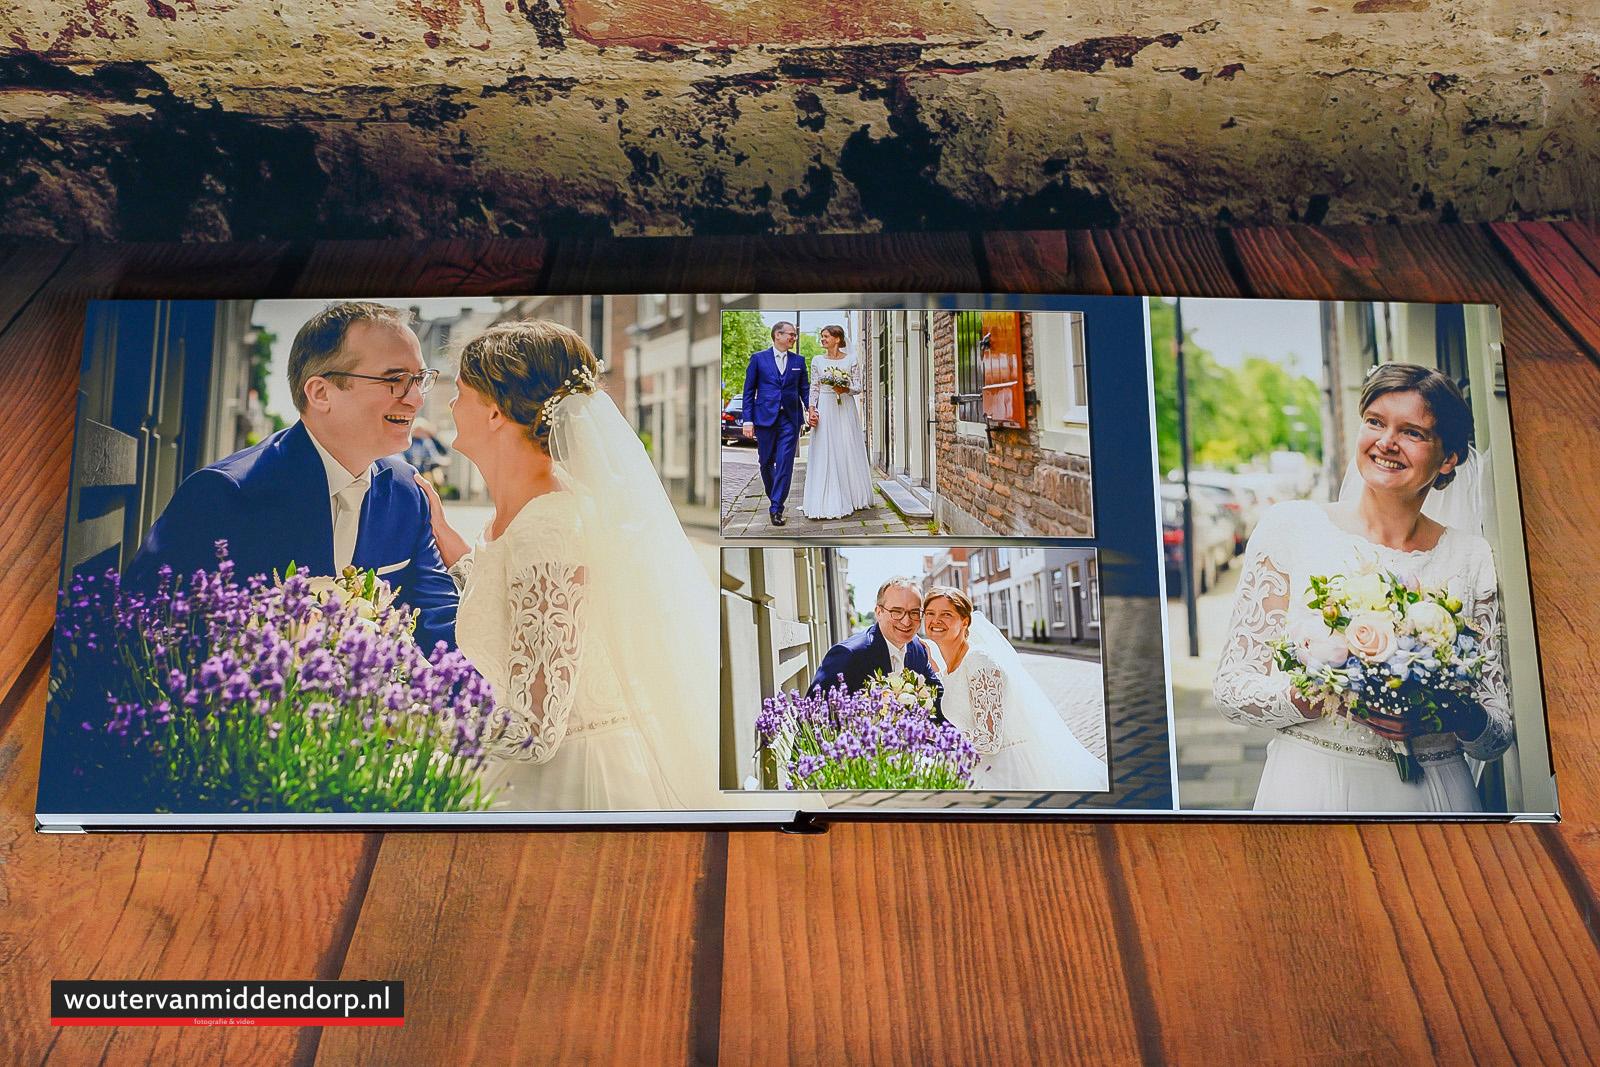 trouwalbum, bruidsreportage, trouwfotograaf, groepsfoto, fotograaf, Wouter van Middendorp, Veluwe, Uddel, Lunteren, (7)